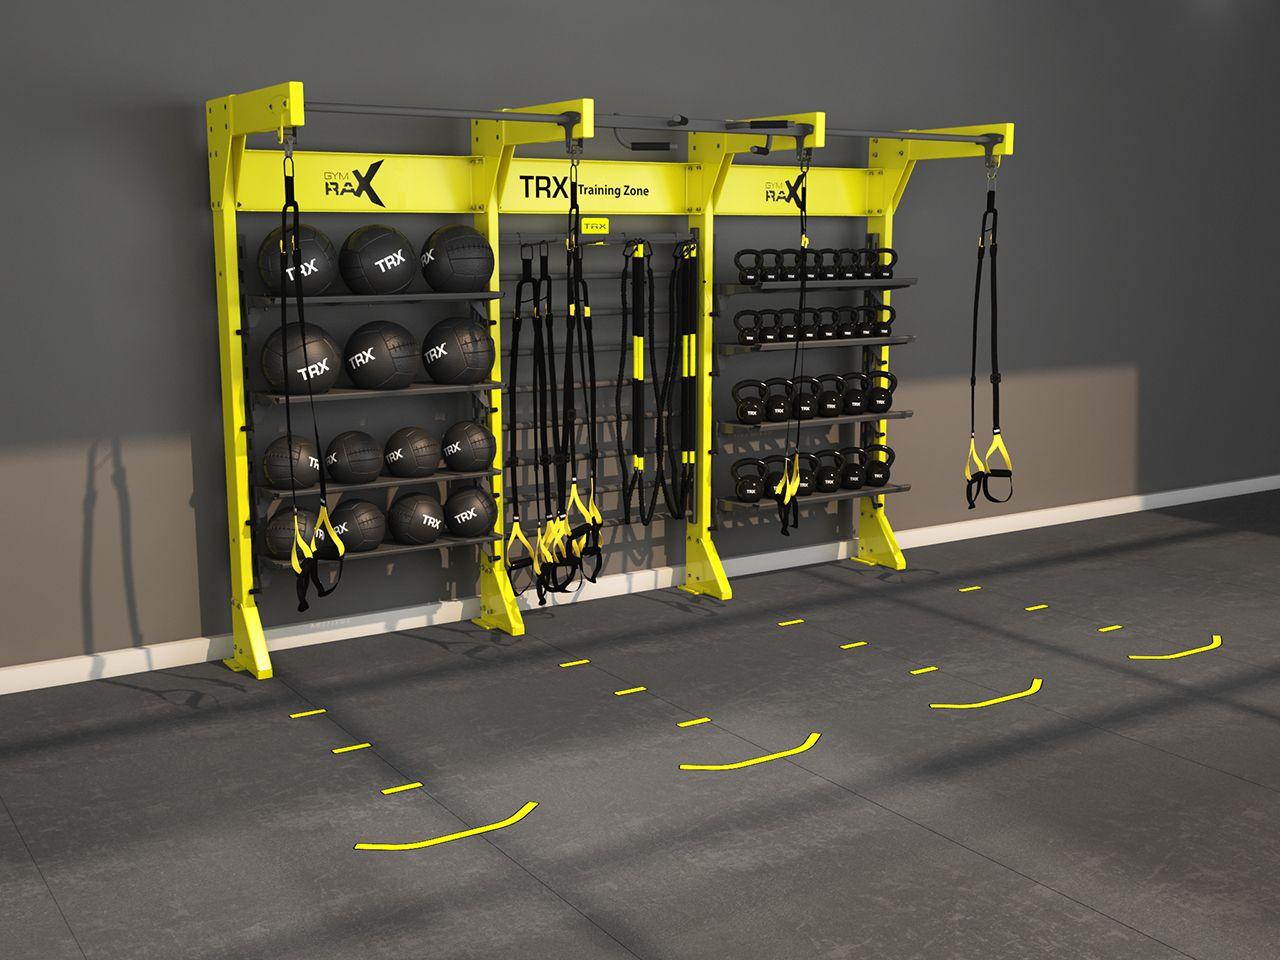 design gym rax trx storage and suspension training structure gym design pinterest. Black Bedroom Furniture Sets. Home Design Ideas